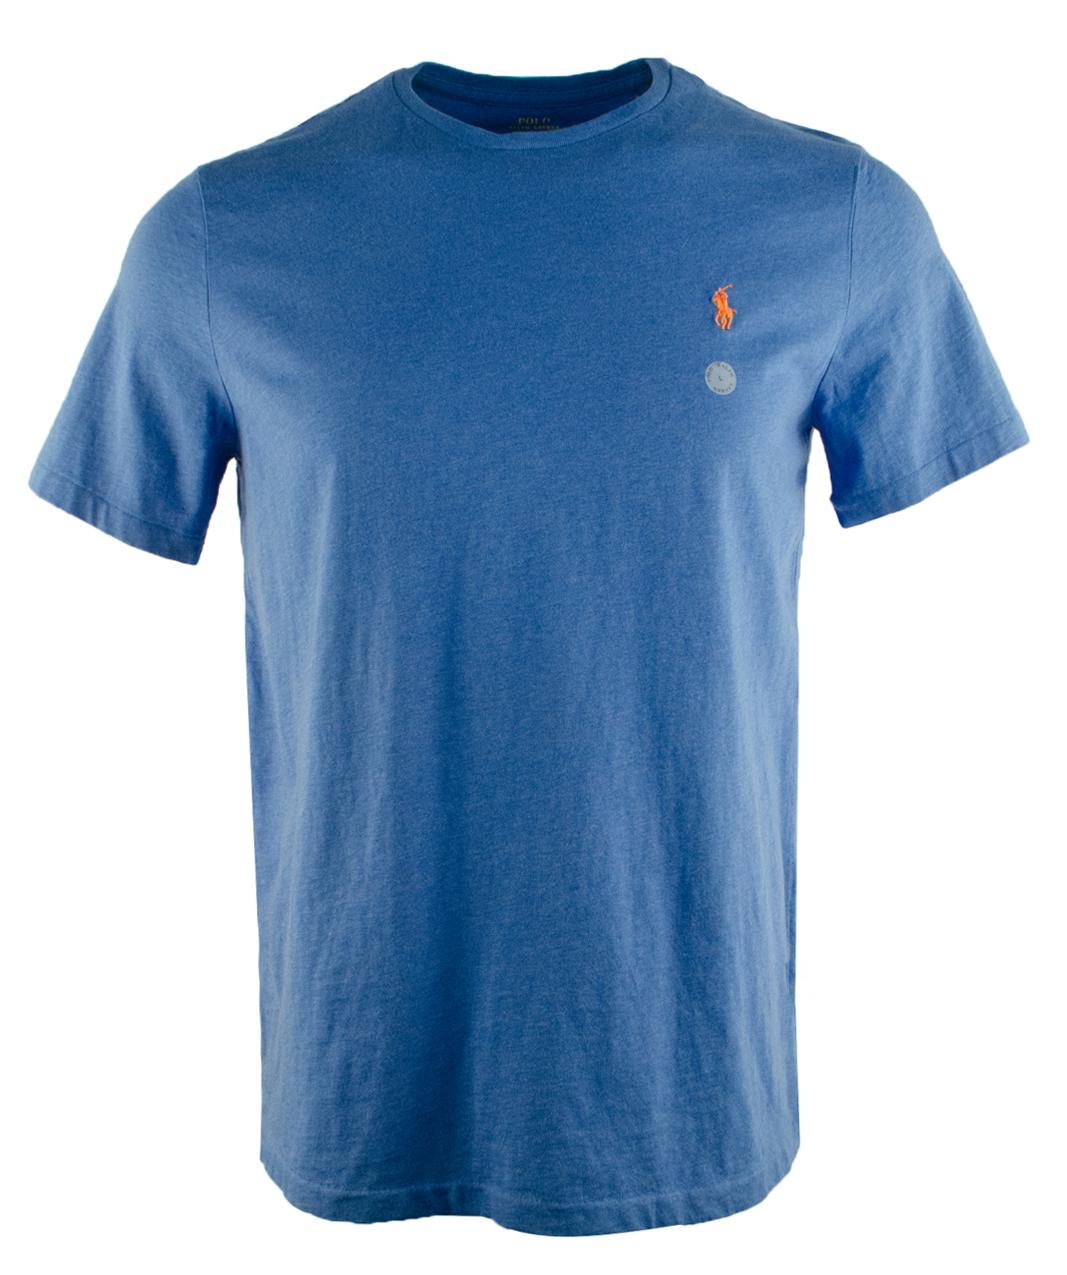 Polo ralph lauren men 39 s custom fit crewneck short sleeve t for Polo custom fit t shirts